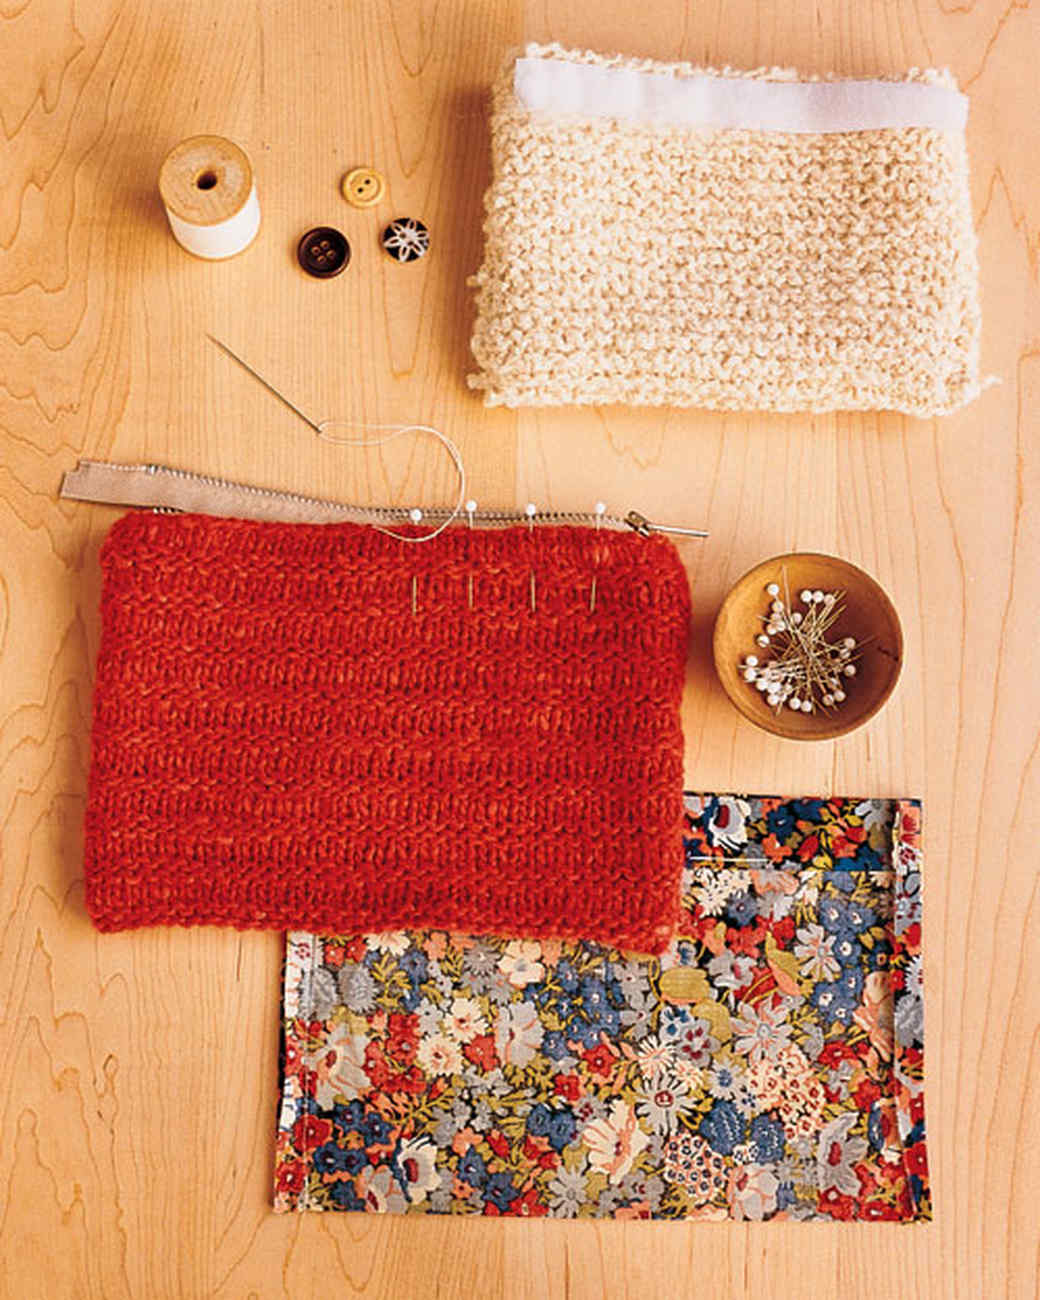 ml302w29_hol06_knitbags.jpg